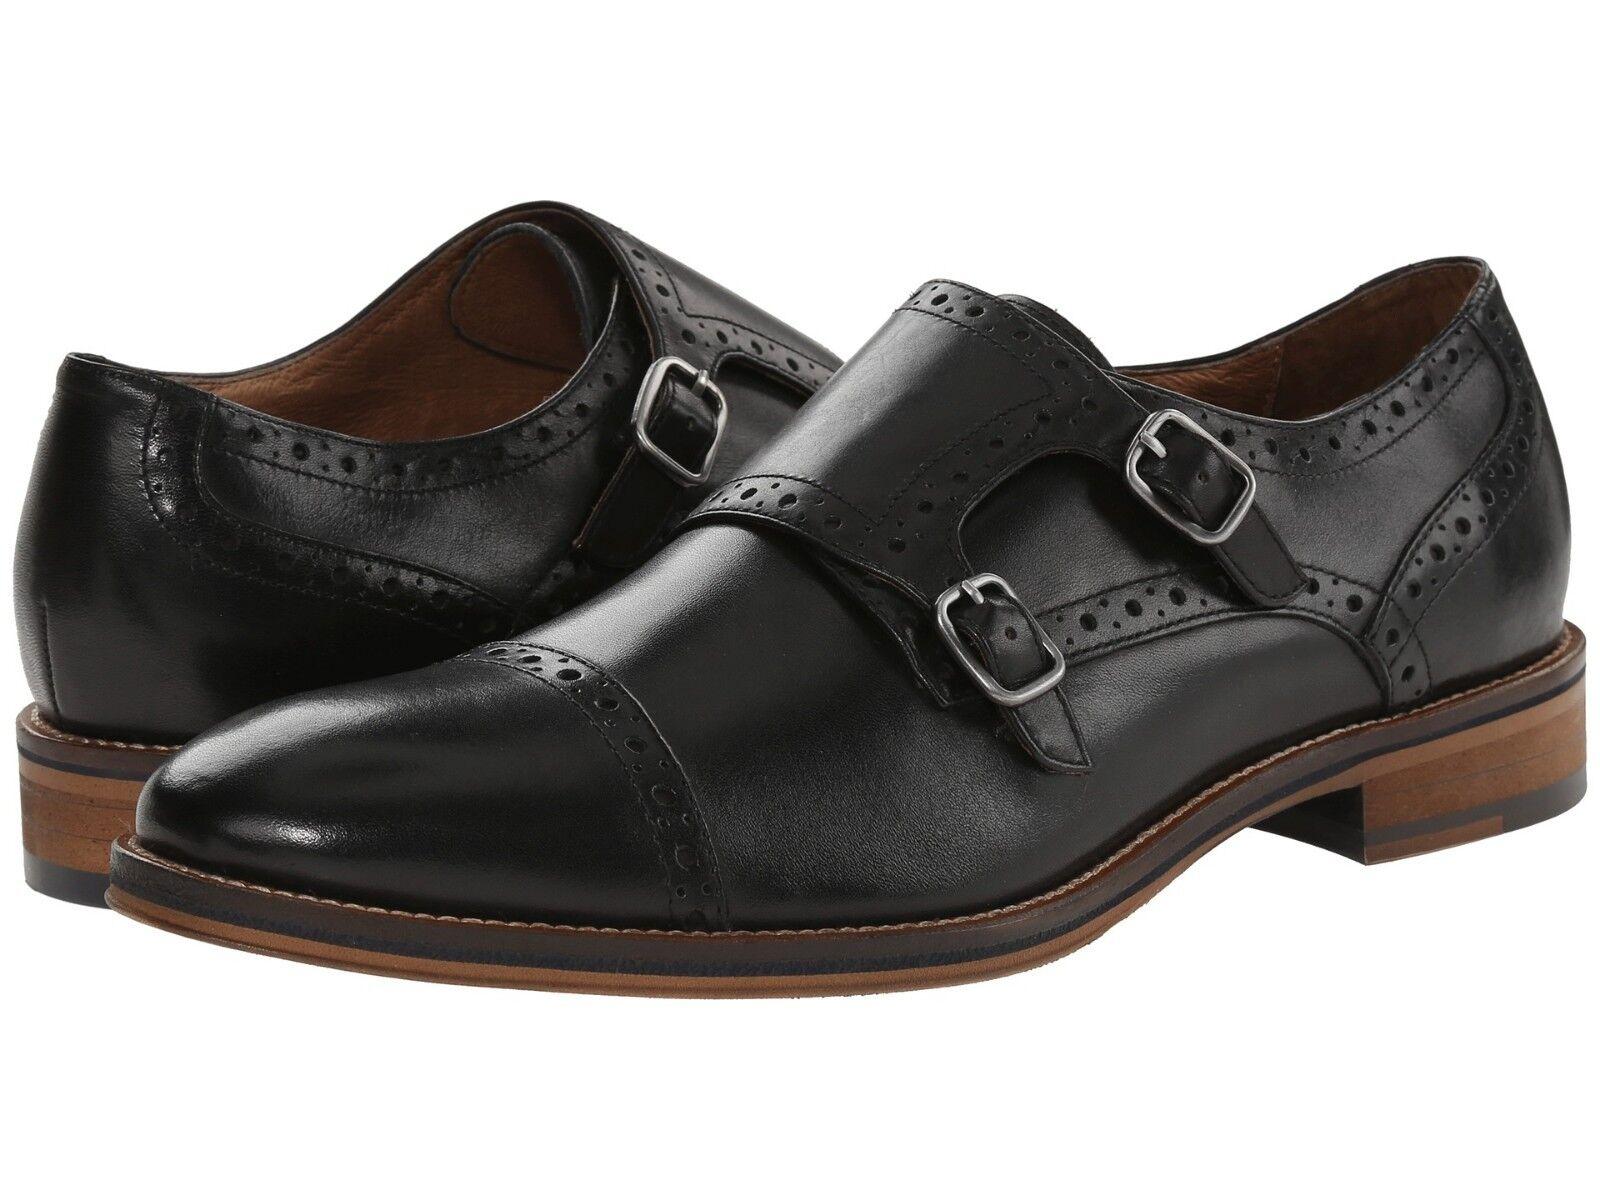 Johnston Murphy para hombre 20-2237 Conard & Negro Zapato de piel de becerro doble monje italiano